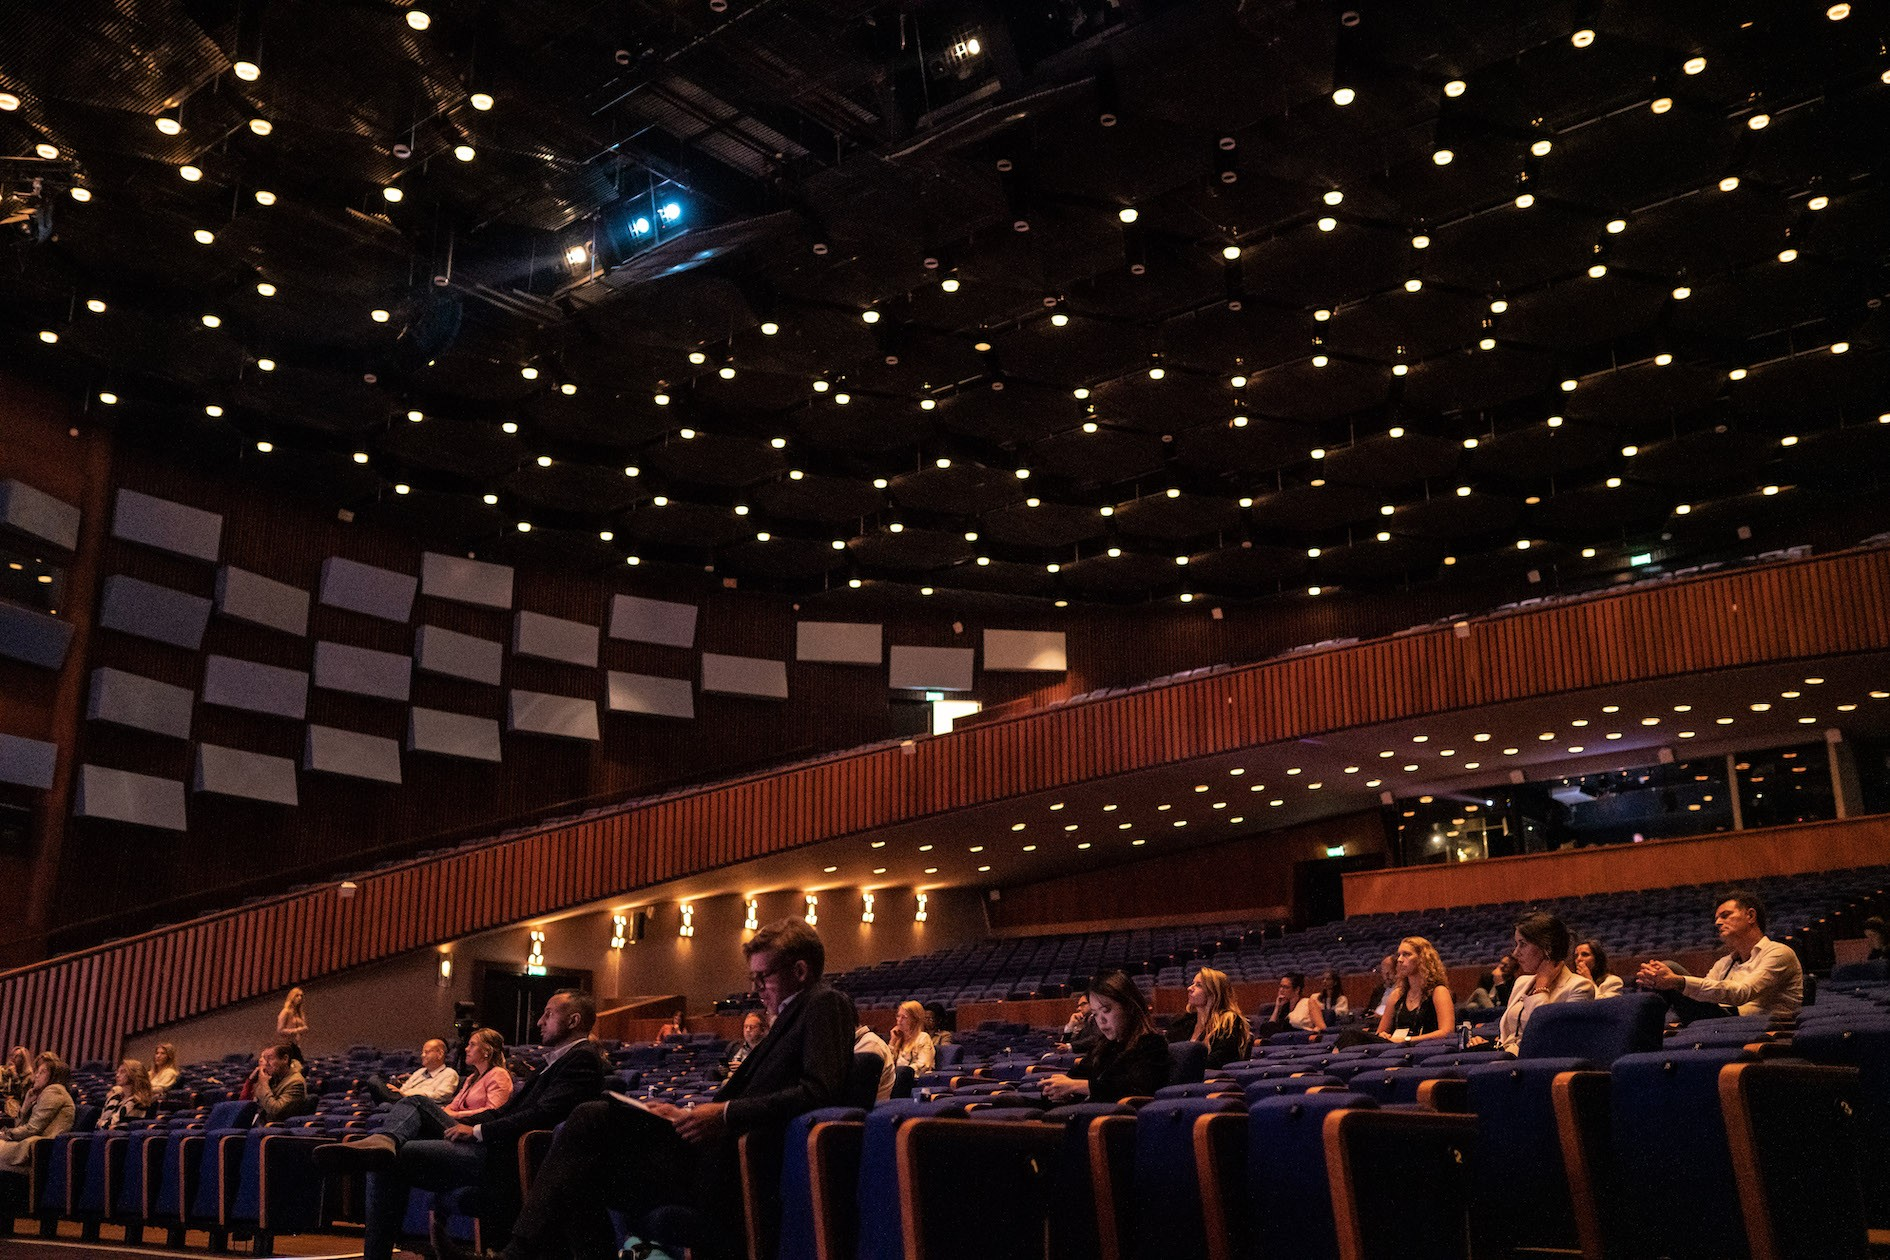 The Hague Convention Bureau hybrid event